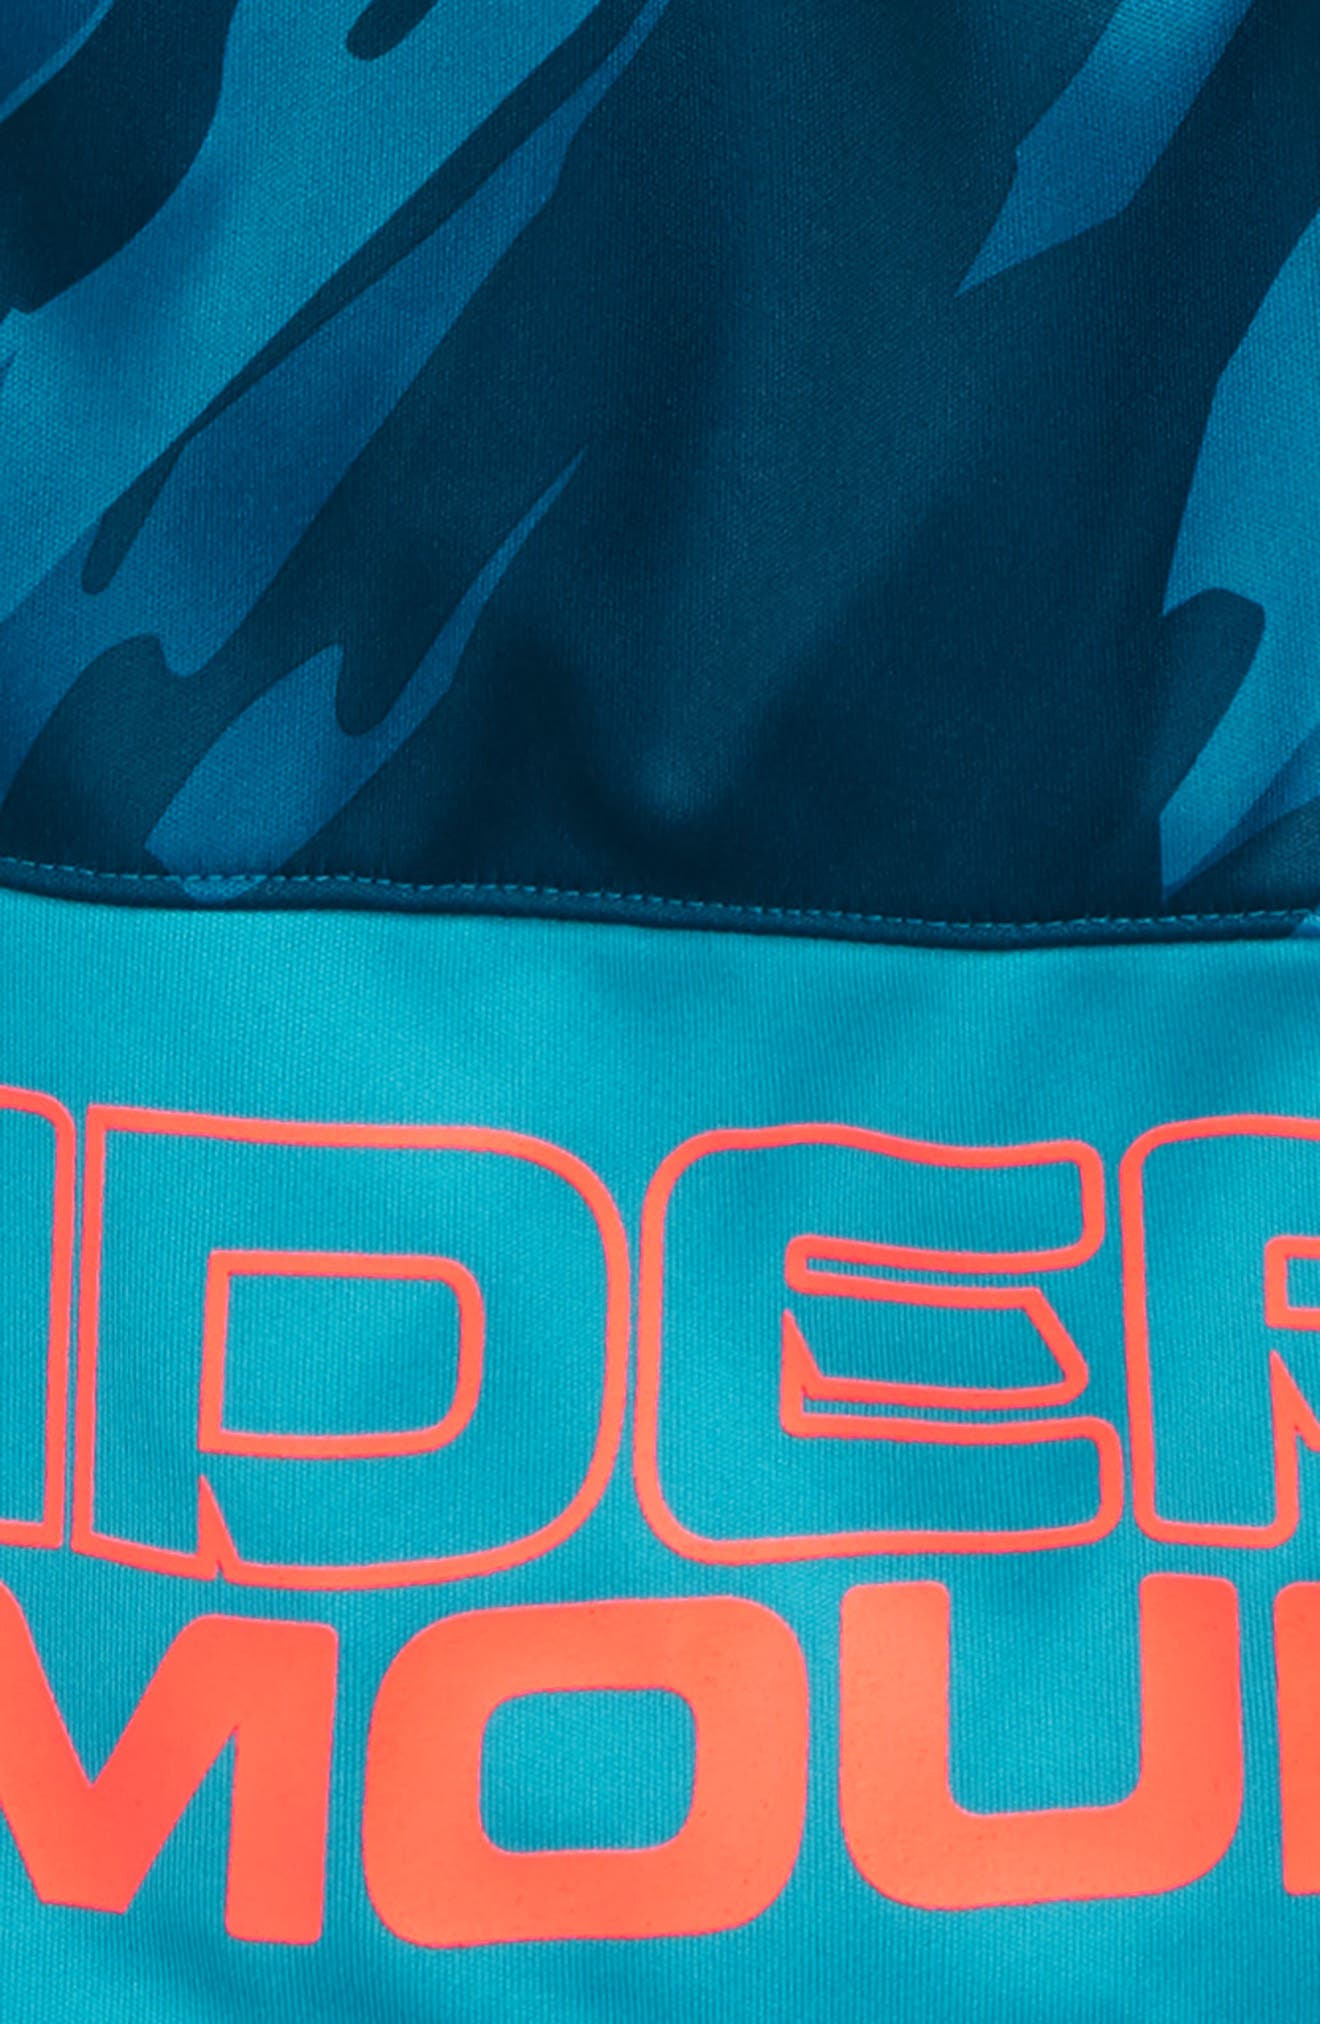 Stunt HeatGear<sup>®</sup> Shorts,                             Alternate thumbnail 3, color,                             DECEIT/ TECHNO TEAL